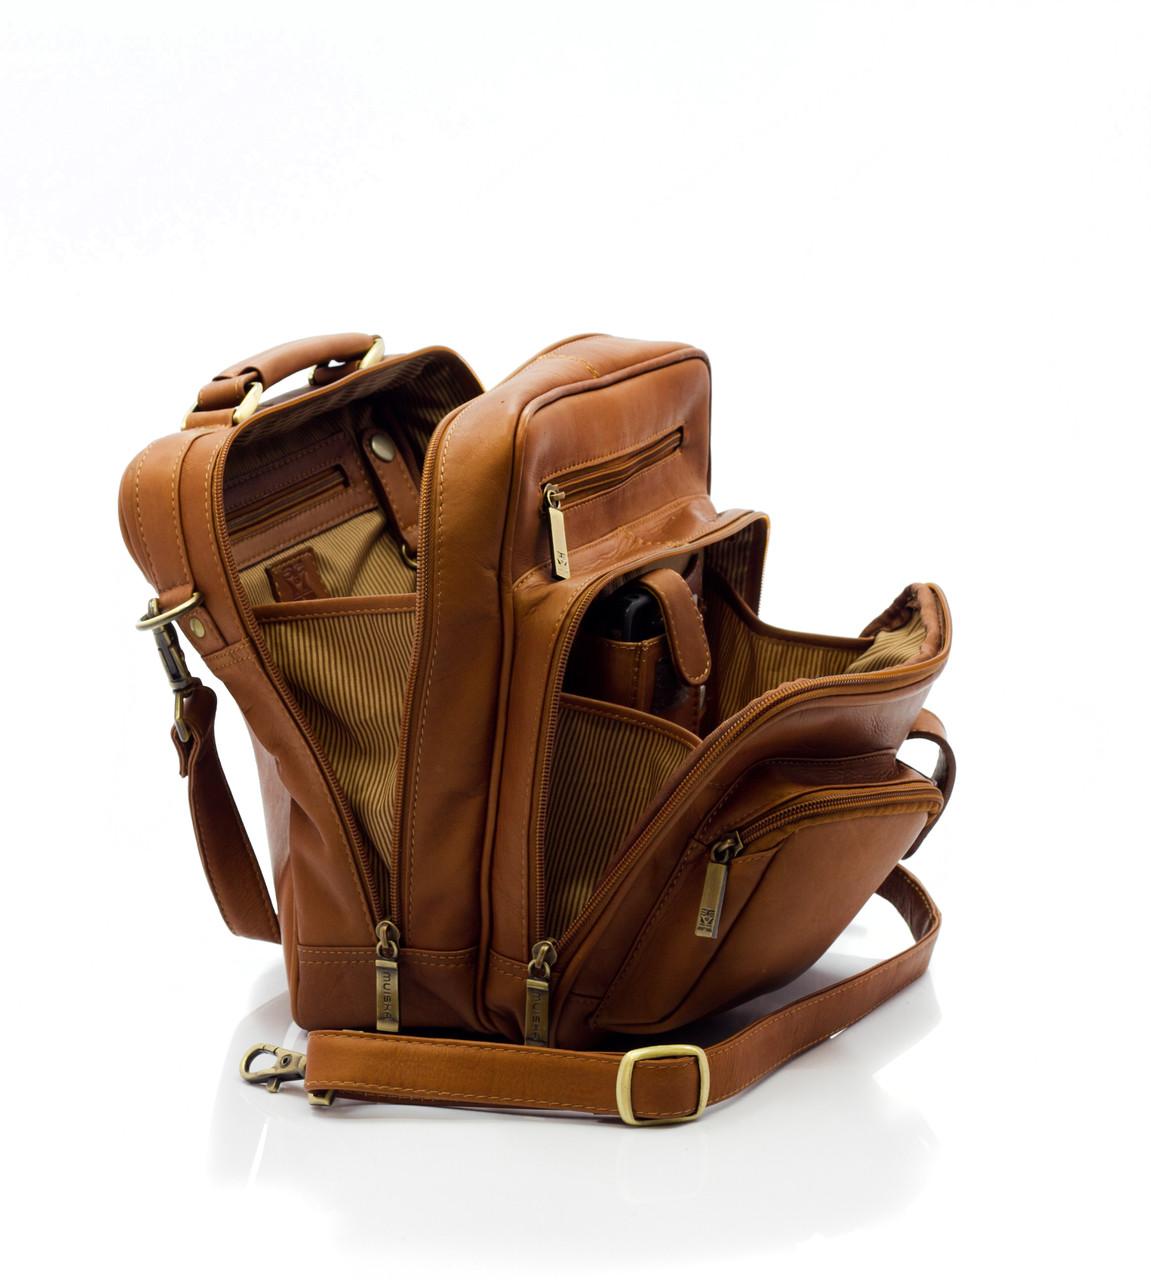 Muiska - Carlos - Men's Leather Cross Body Everyday Bag - spacious and utilitarian design